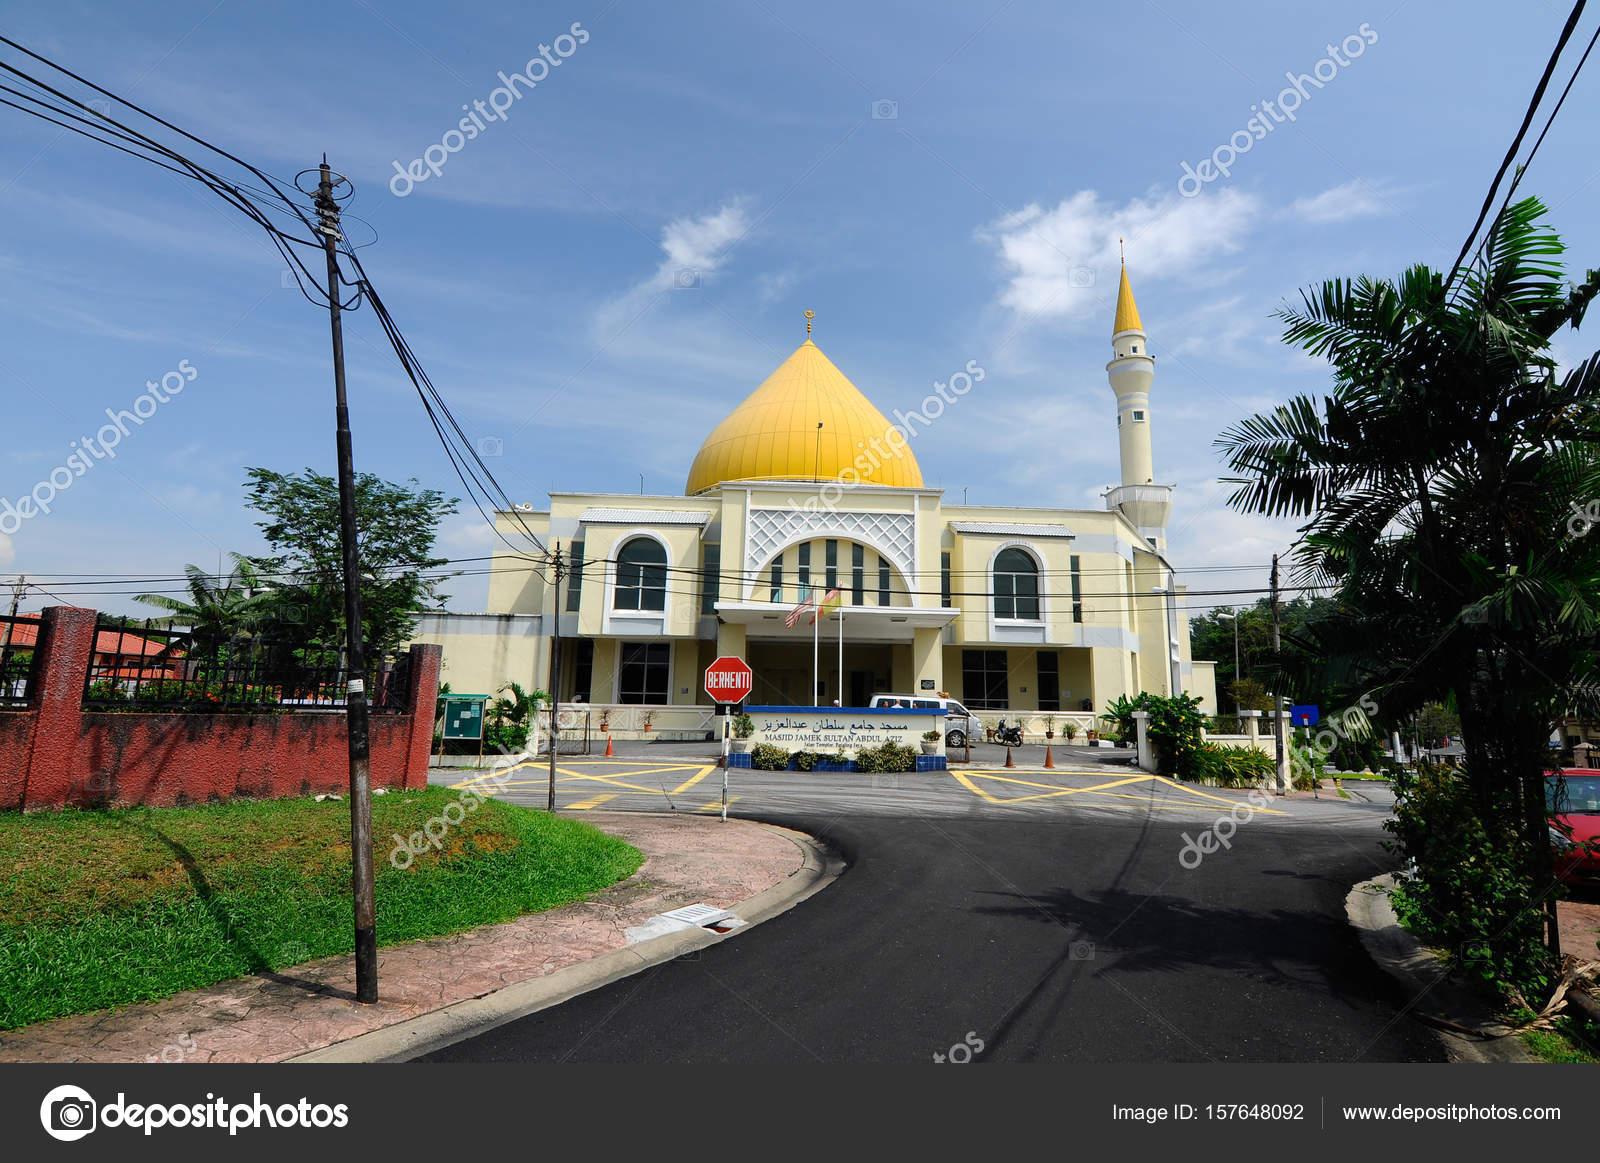 Exterior Of Masjid Jamek Sultan Abdul Aziz Stock Editorial Photo C Aisyaqilumar 157648092